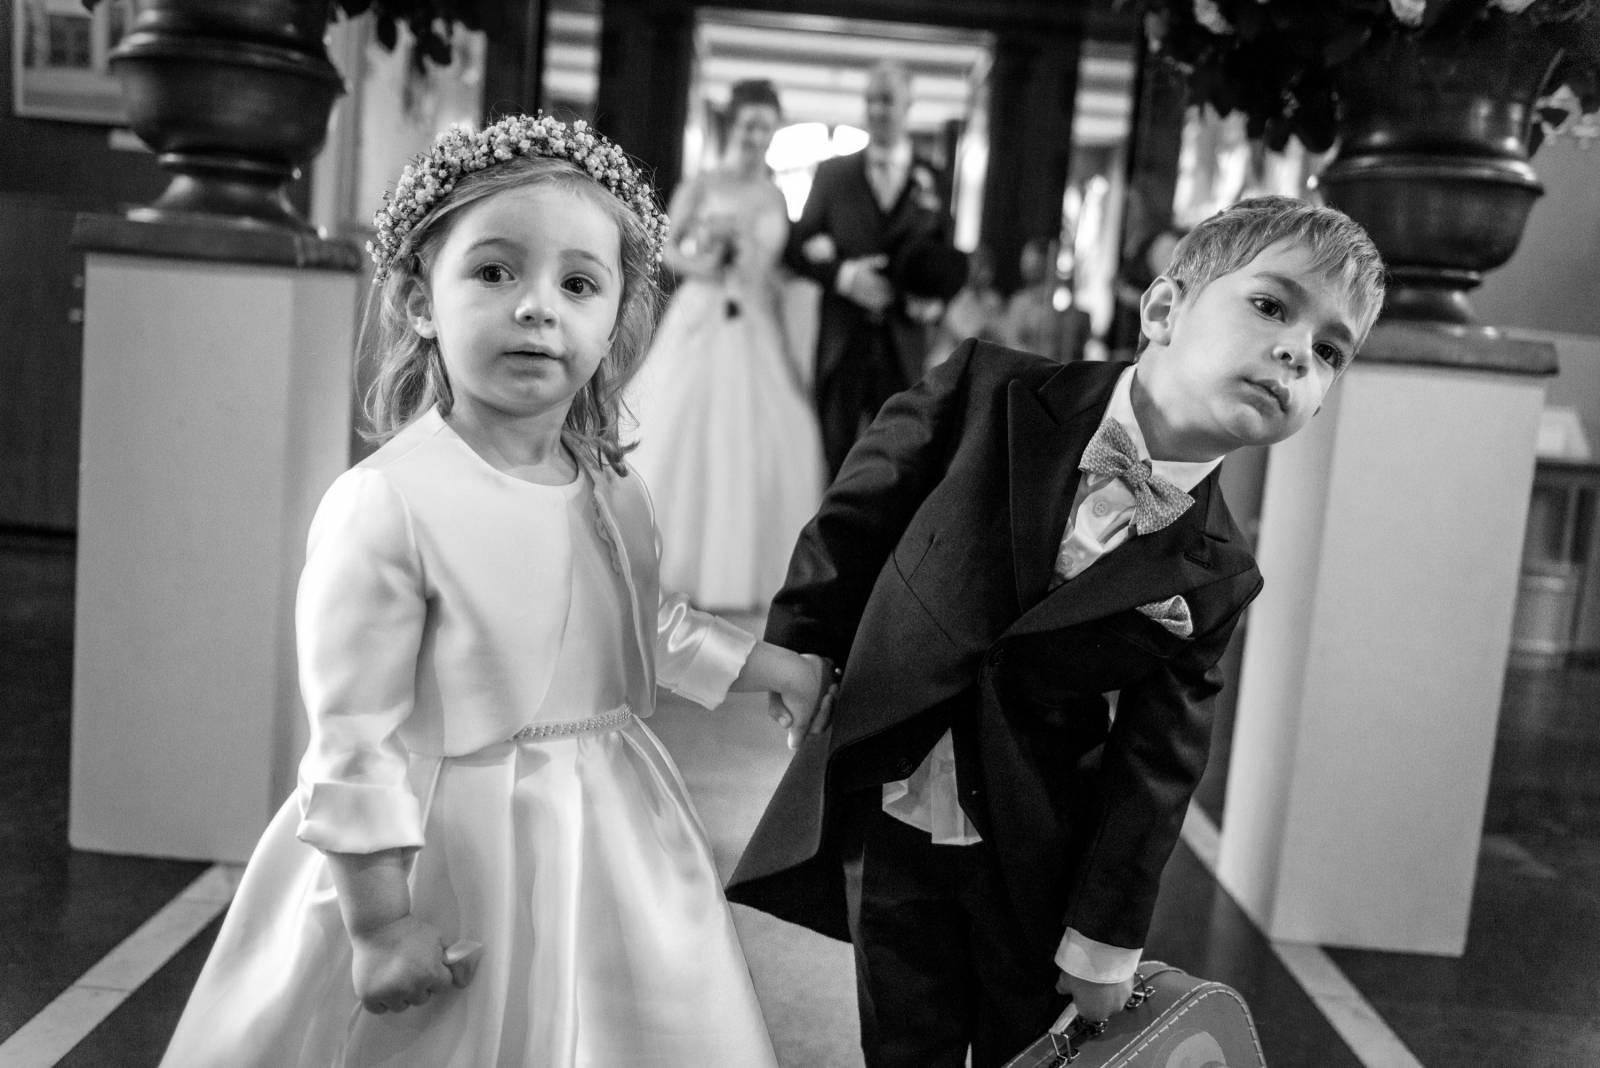 Fotografie Melody - Huwelijksfotograaf - Trouwfotograaf - House of Weddings - 8